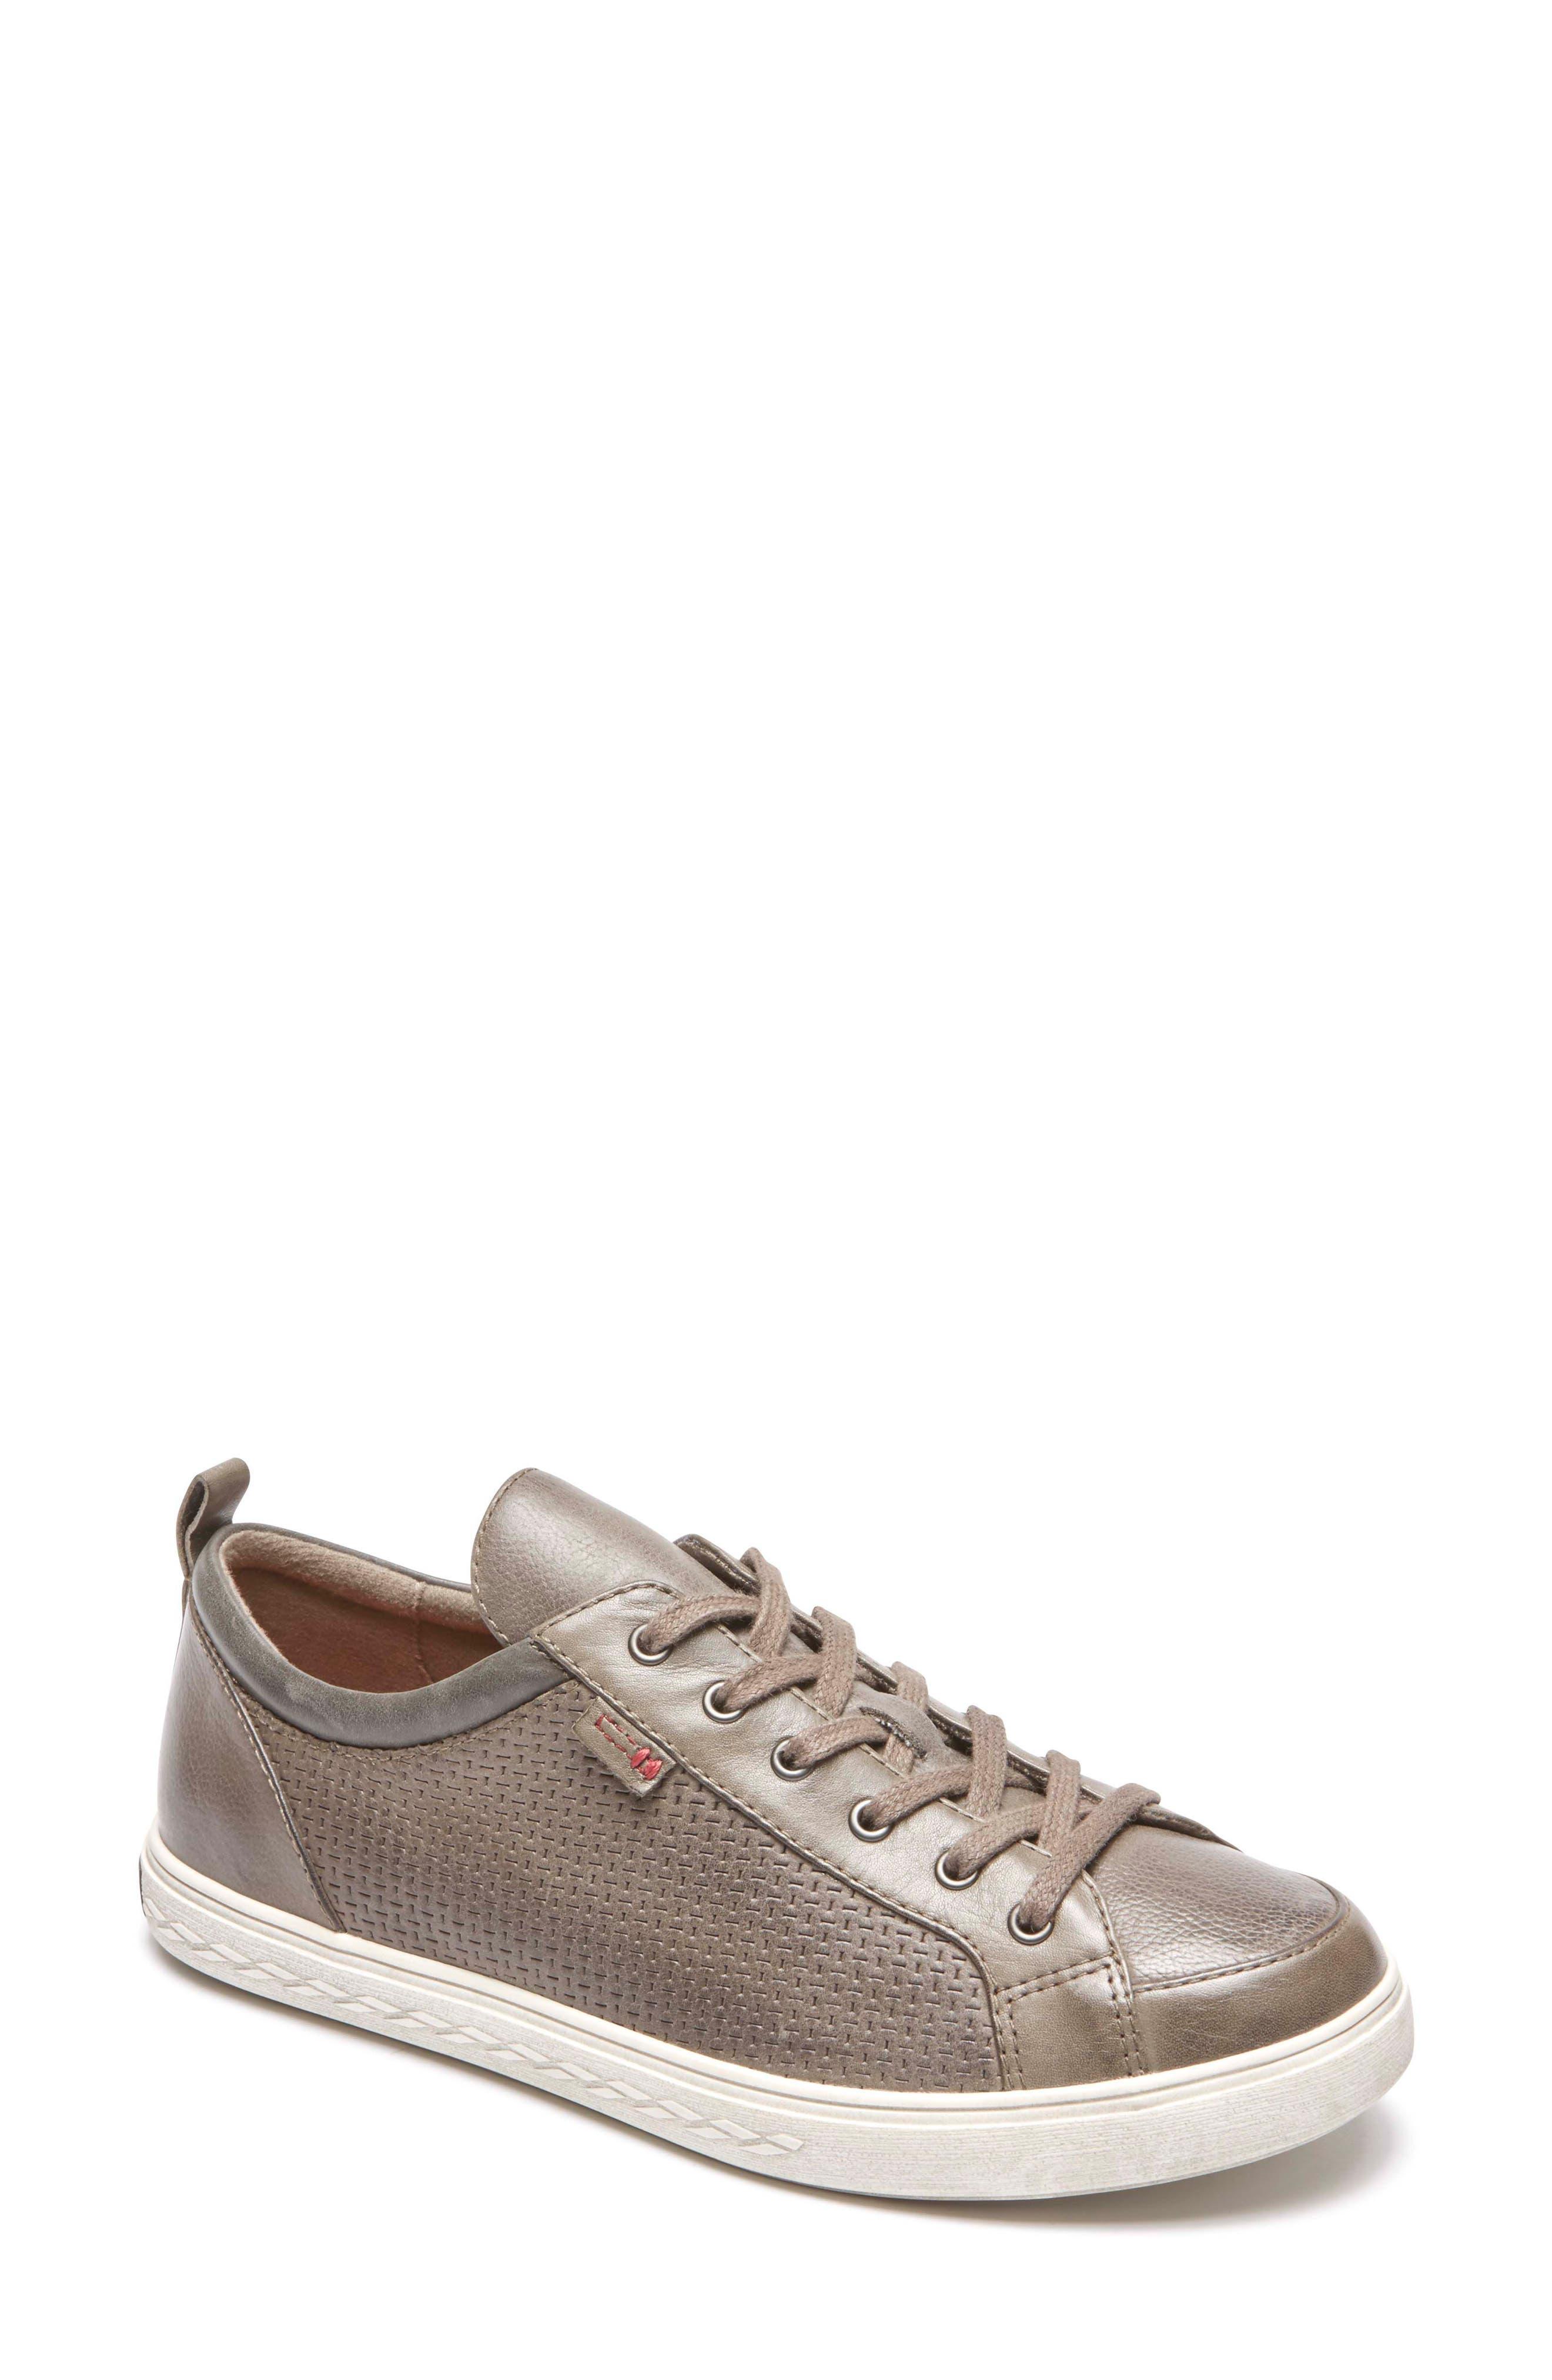 Rockport Cobb Hill Willa Sneaker, Grey